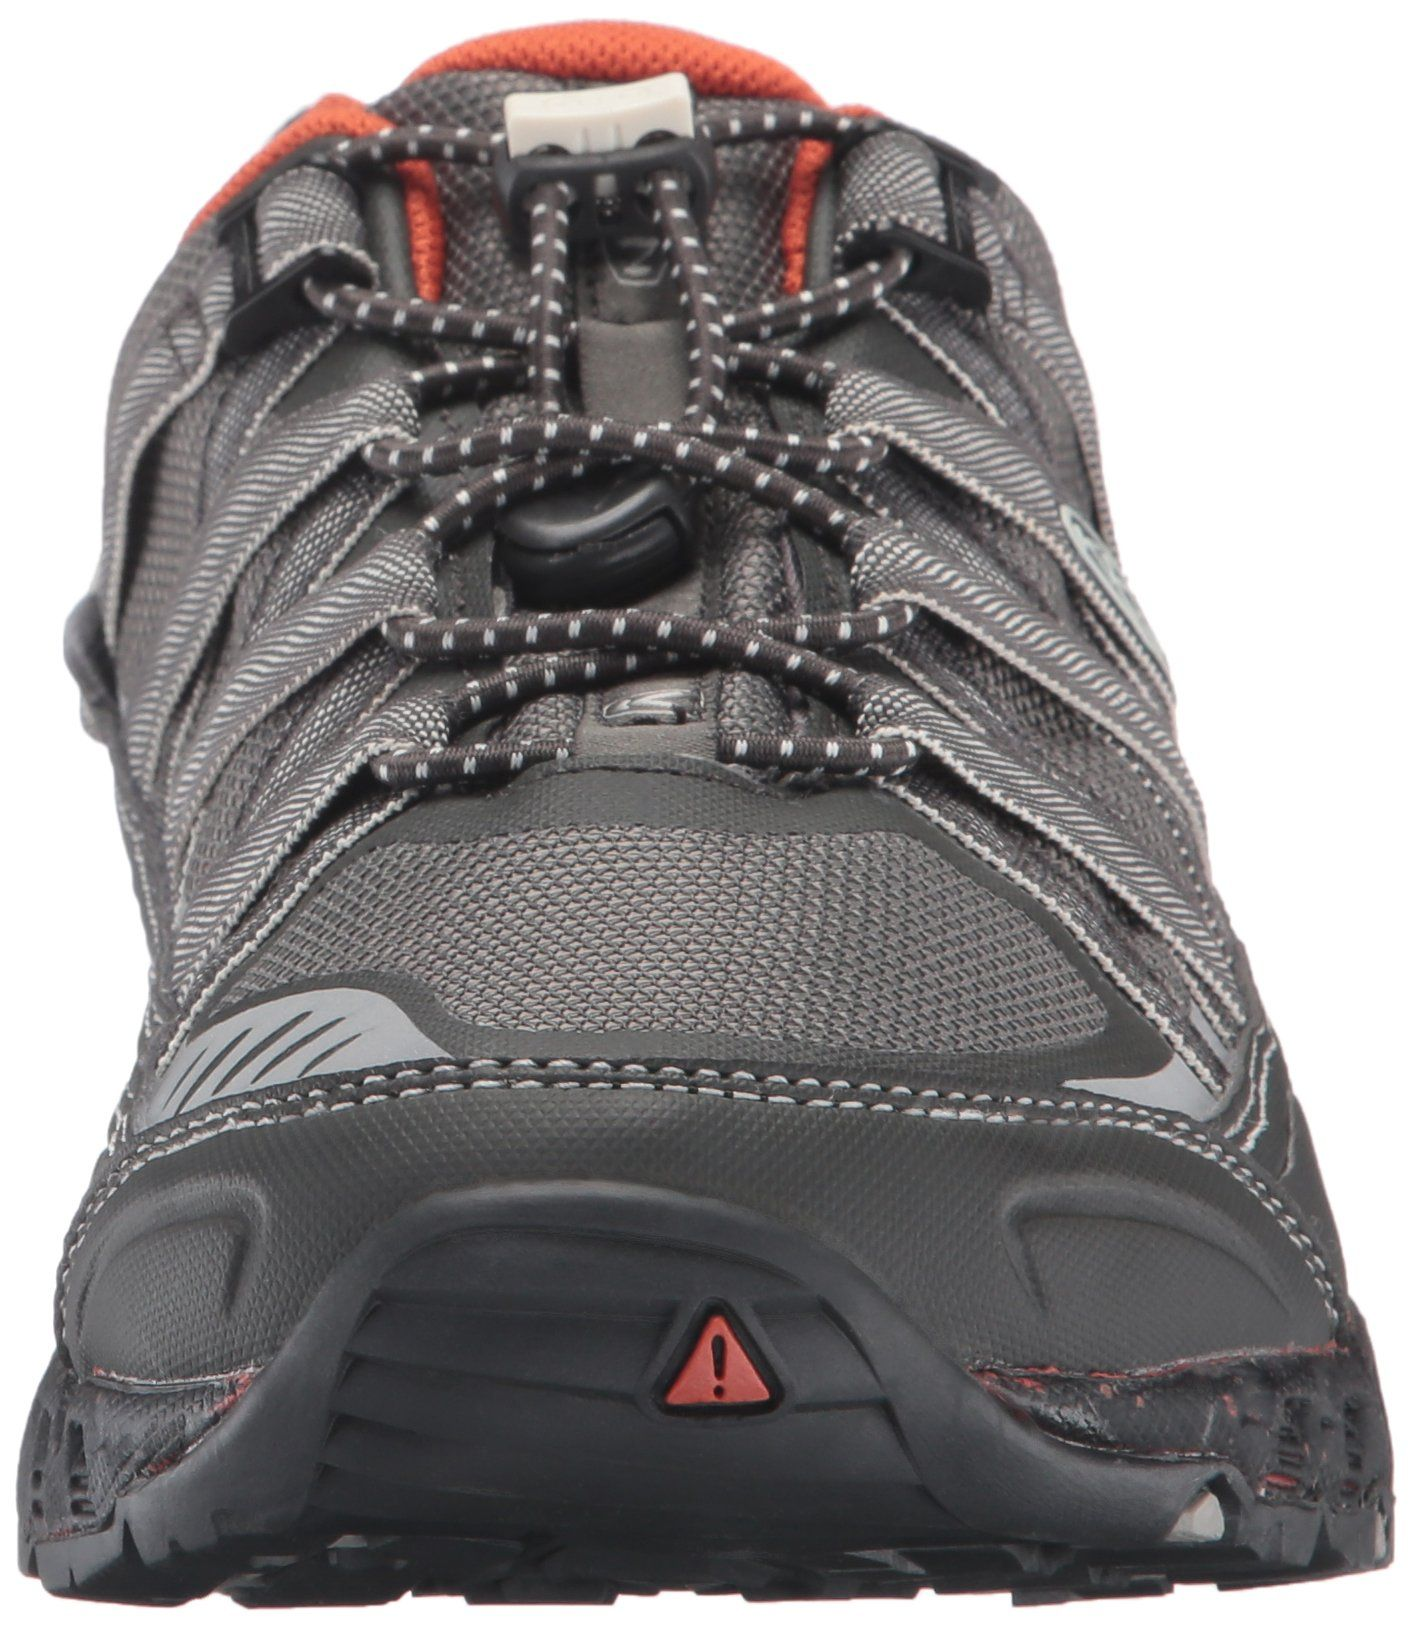 f29655c1151 KEEN Mens Versatrail Waterproof Hiking Boot Raven/Burnt Ochre 7.5 M ...